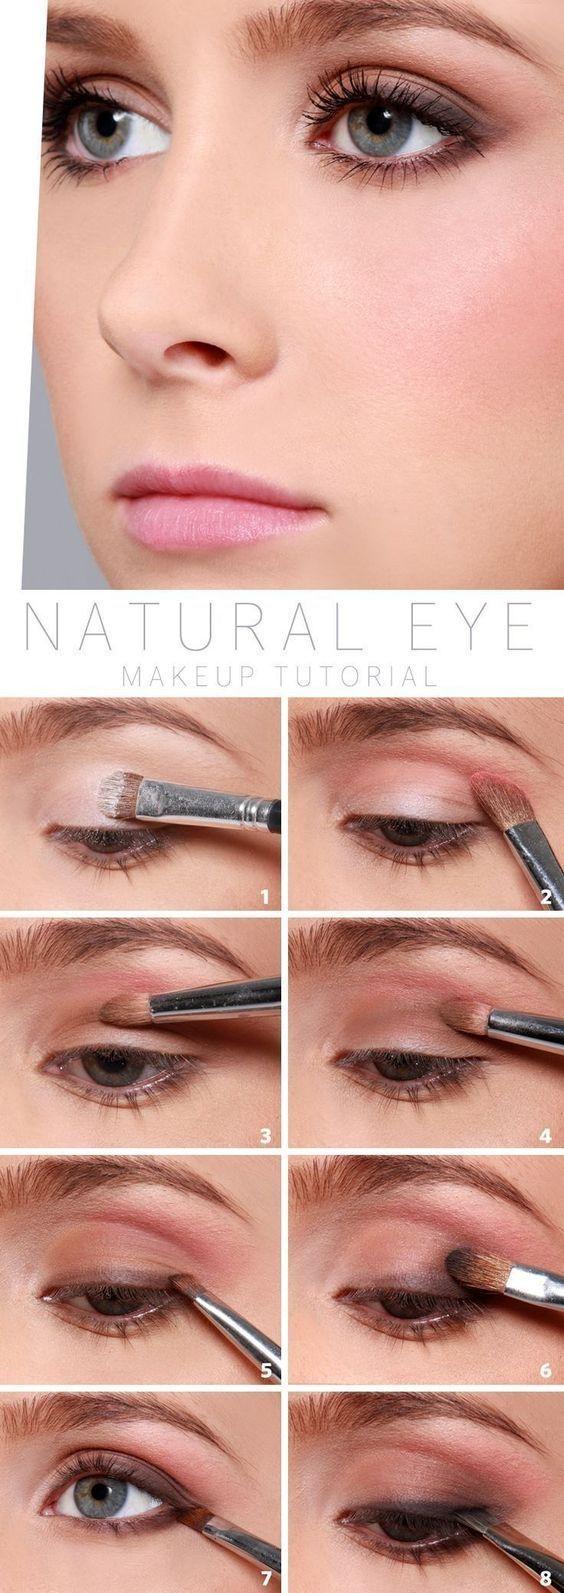 Step By Step Makeup Tutorials For Teens - eye makeup ideas